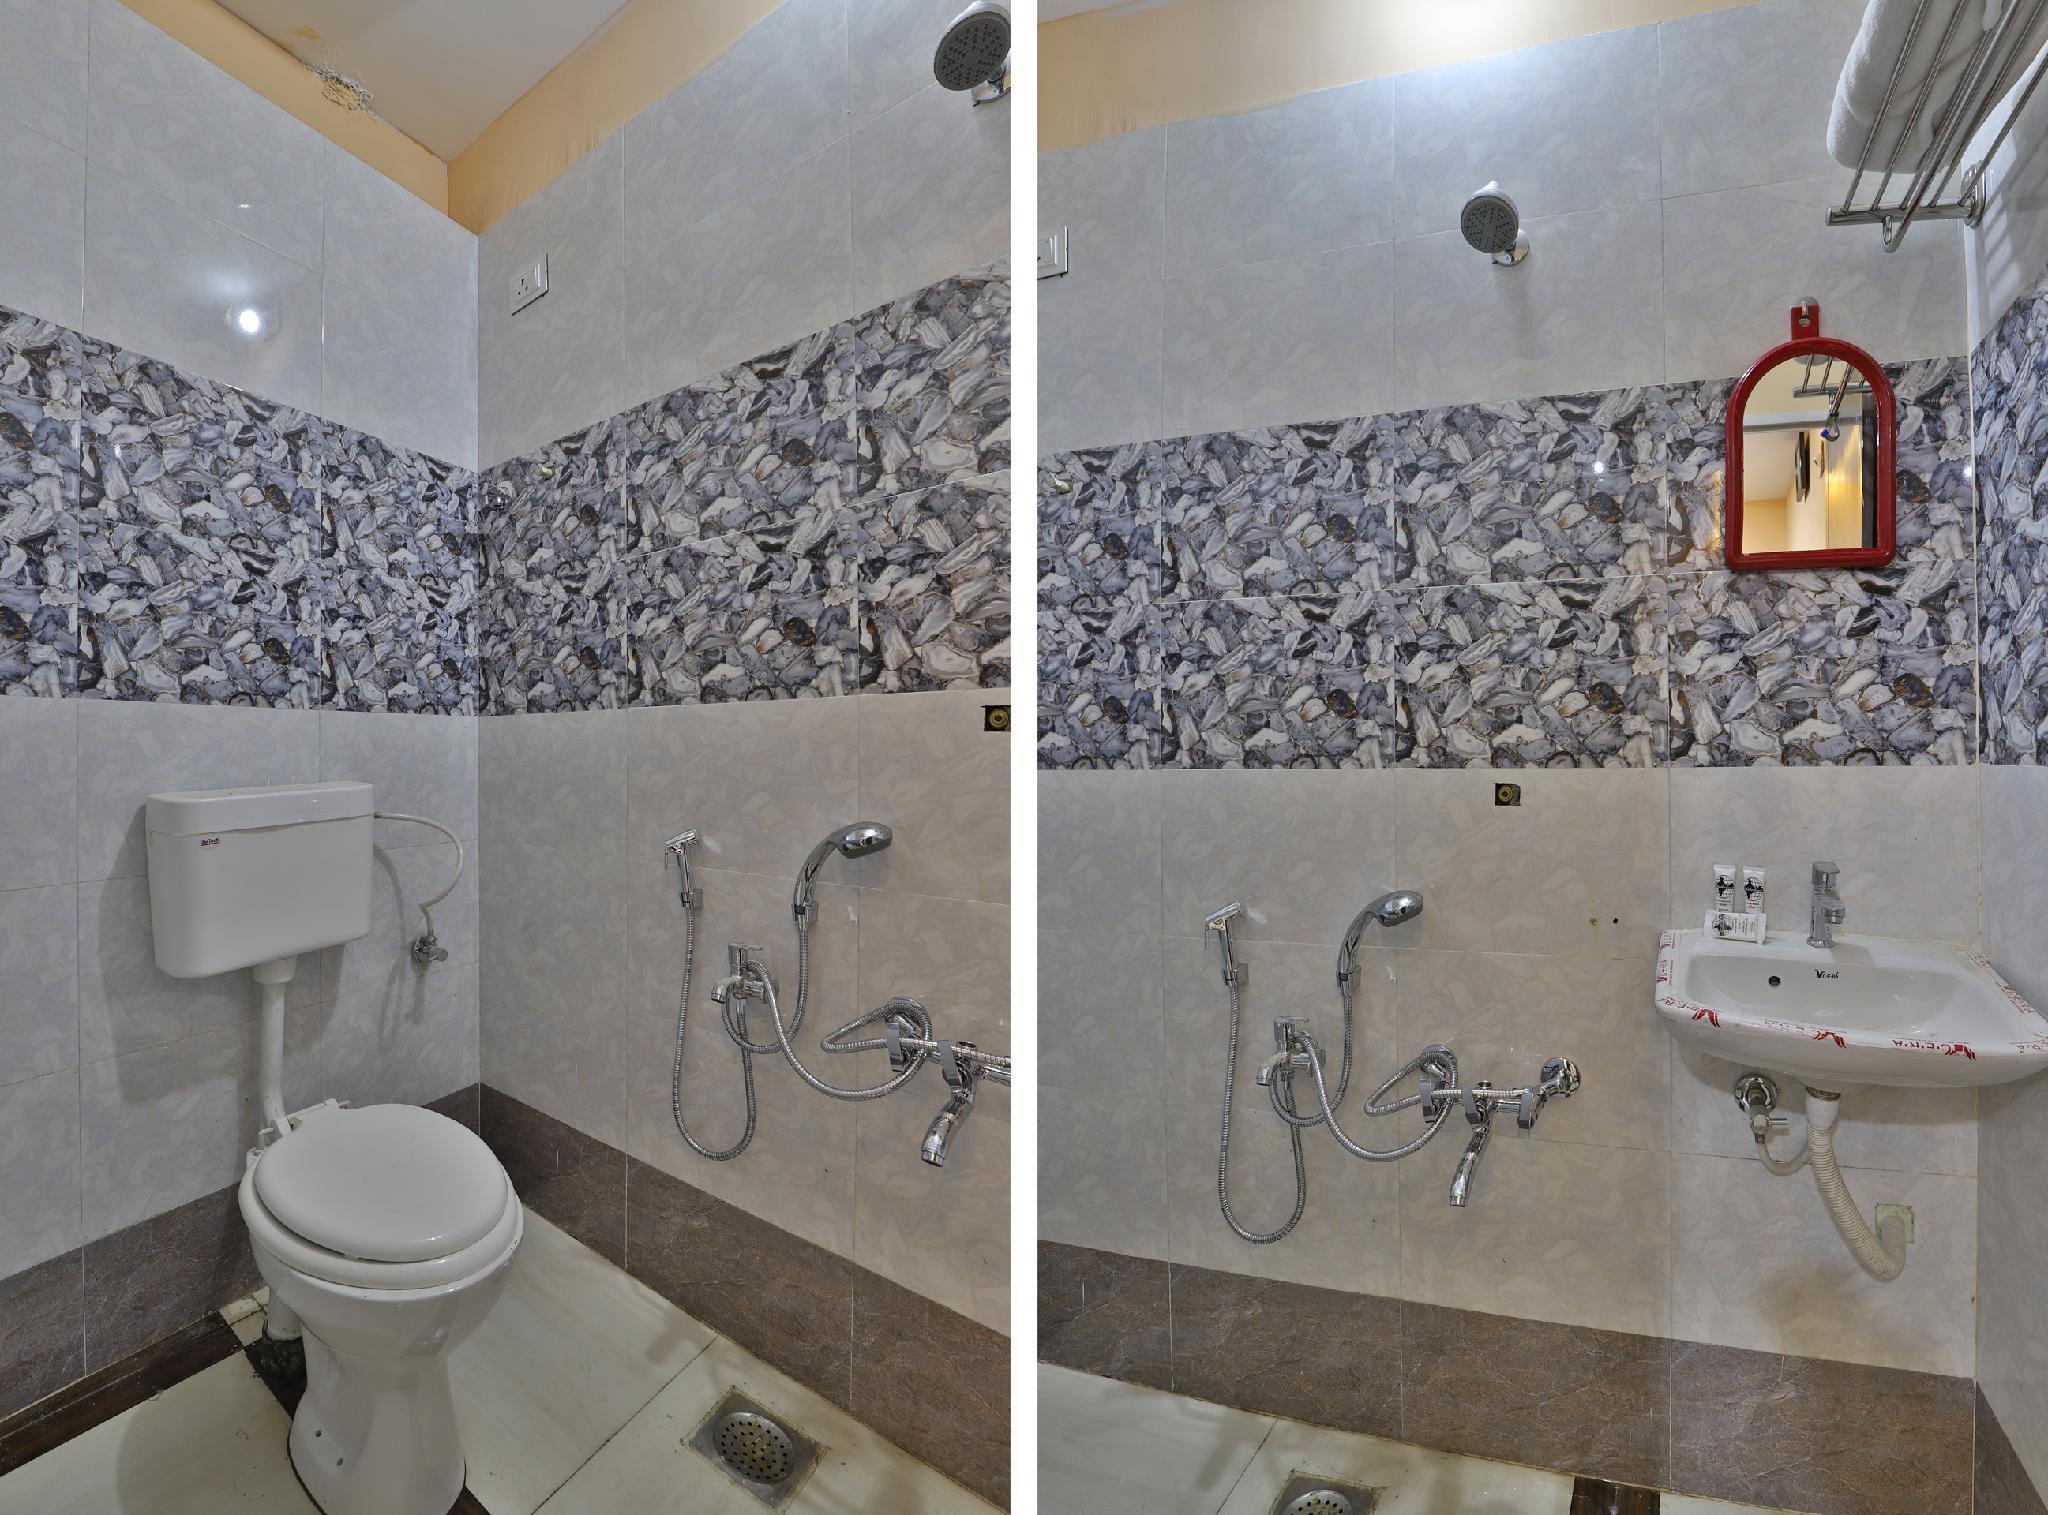 OYO 41050 Kritika Hotel, Gandhinagar